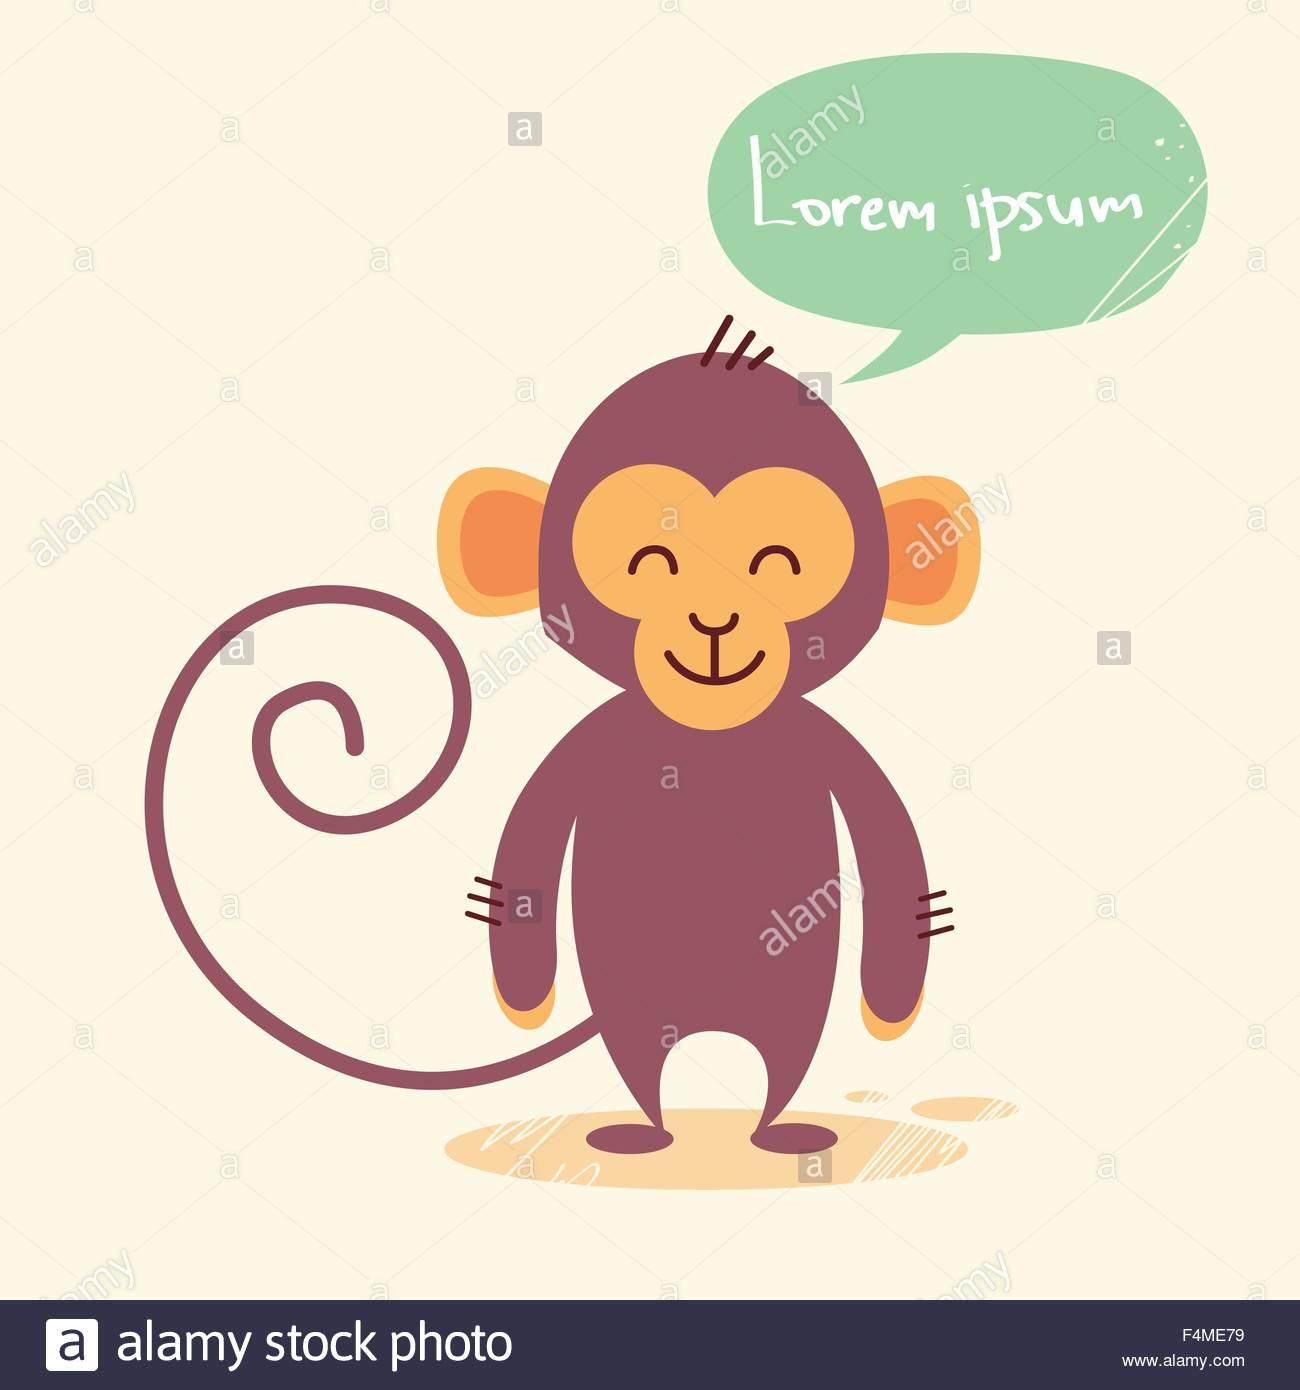 1300x1390 Cute Monkey Cartoon Chat Bubble Drawing Stock Vector Art